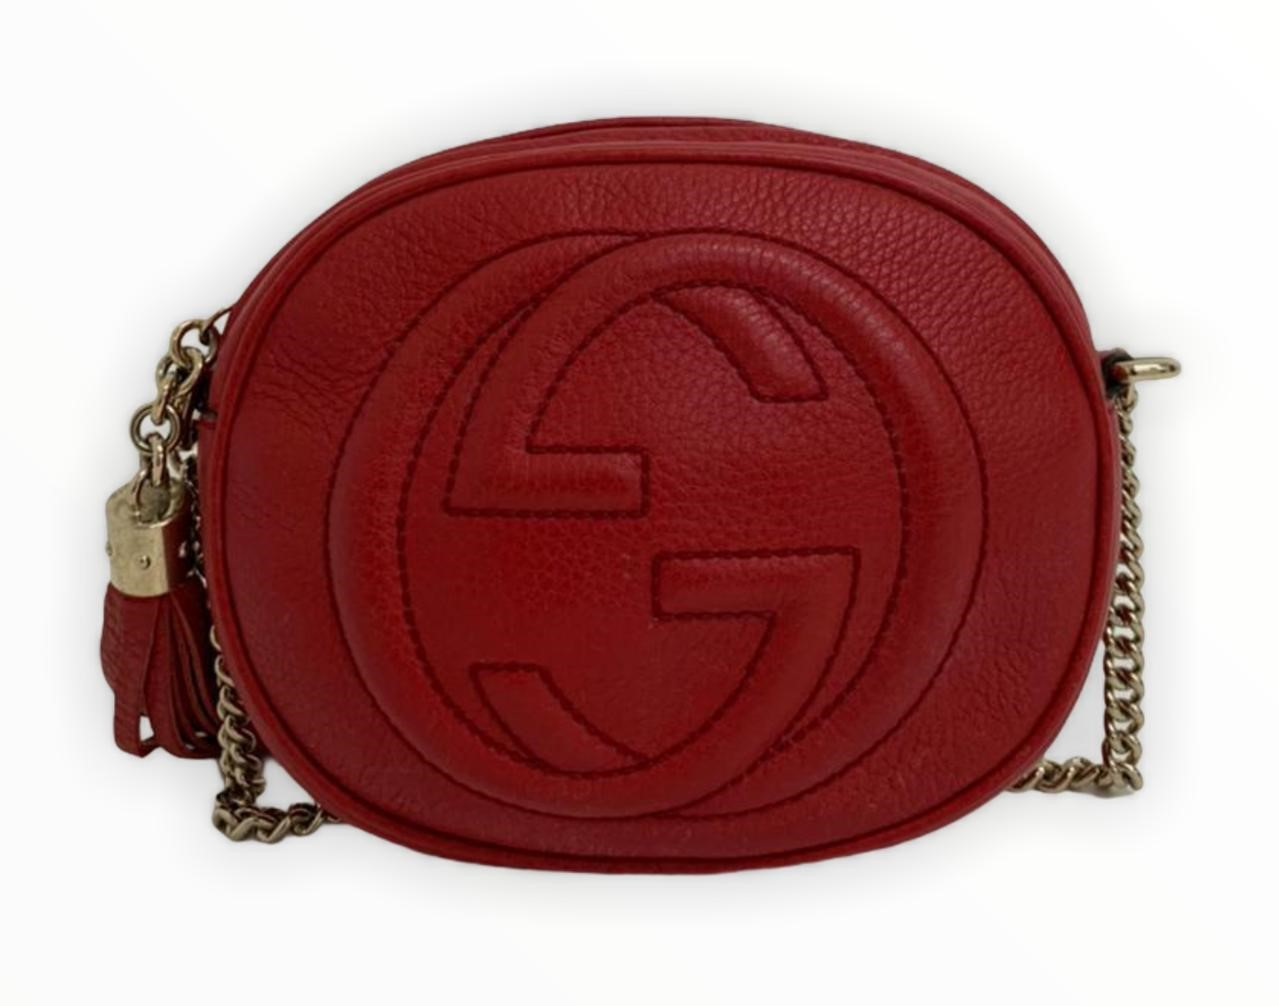 Bolsa Gucci Soho Nubuck Mini Chain Vermelha